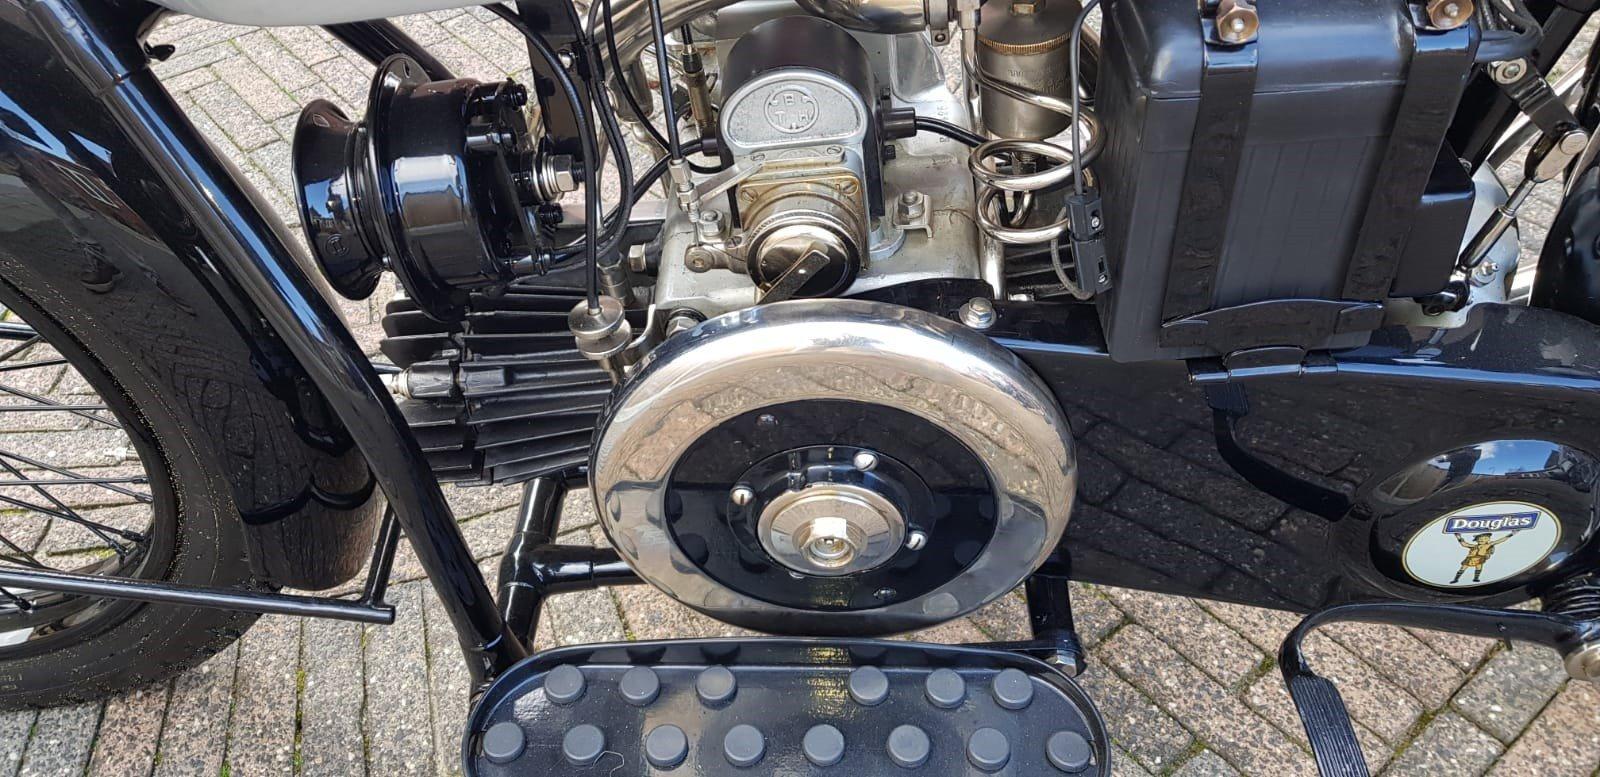 Douglas 1929 600cc SOLD (picture 6 of 6)